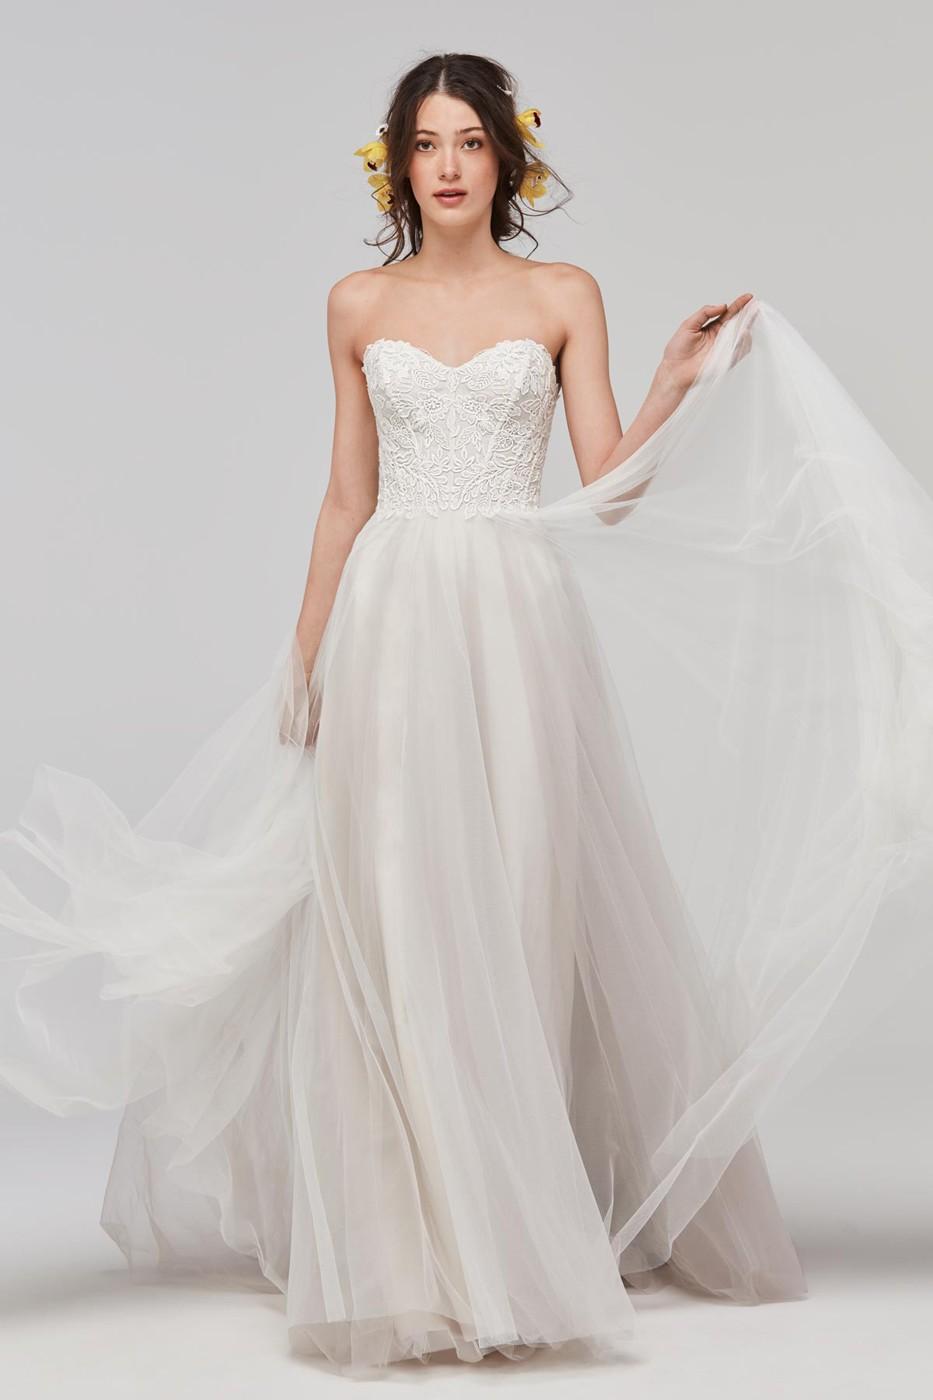 wedding dresses with sweetheart neckline photo - 1